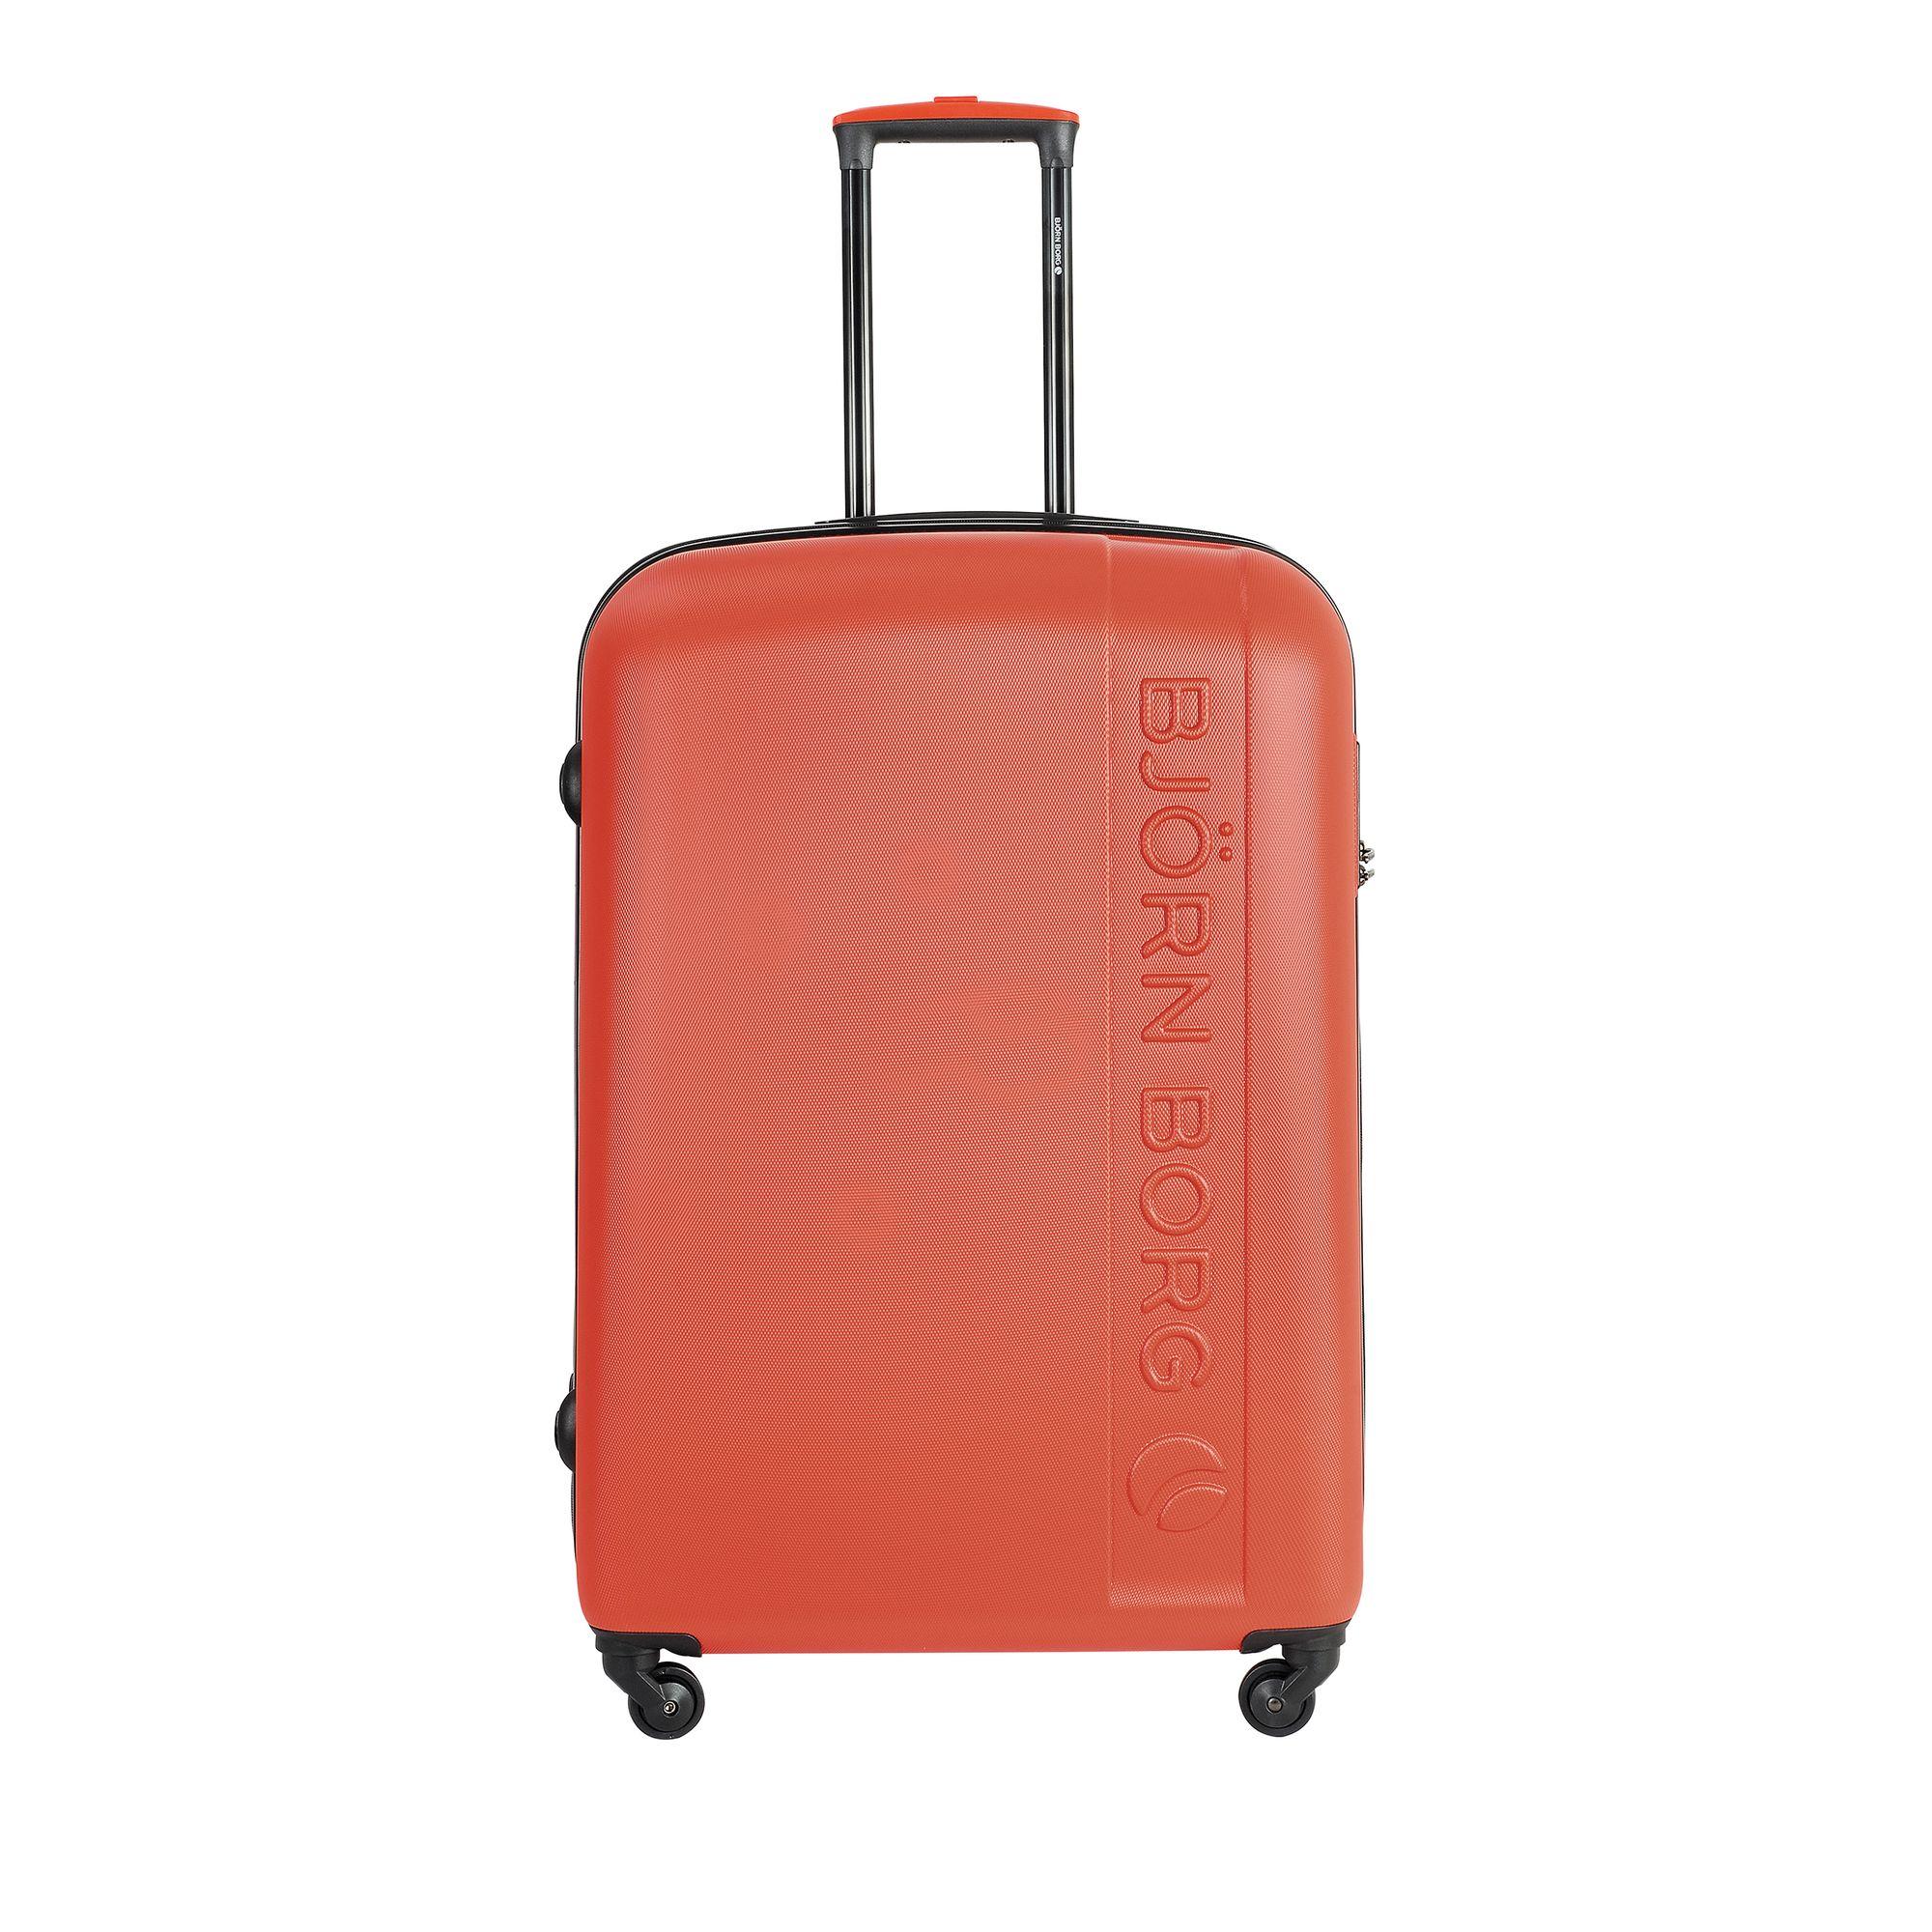 Björn Borg Hot Solid resväska, 4 hjul, 55/65/78 cm, Orange, 78cm